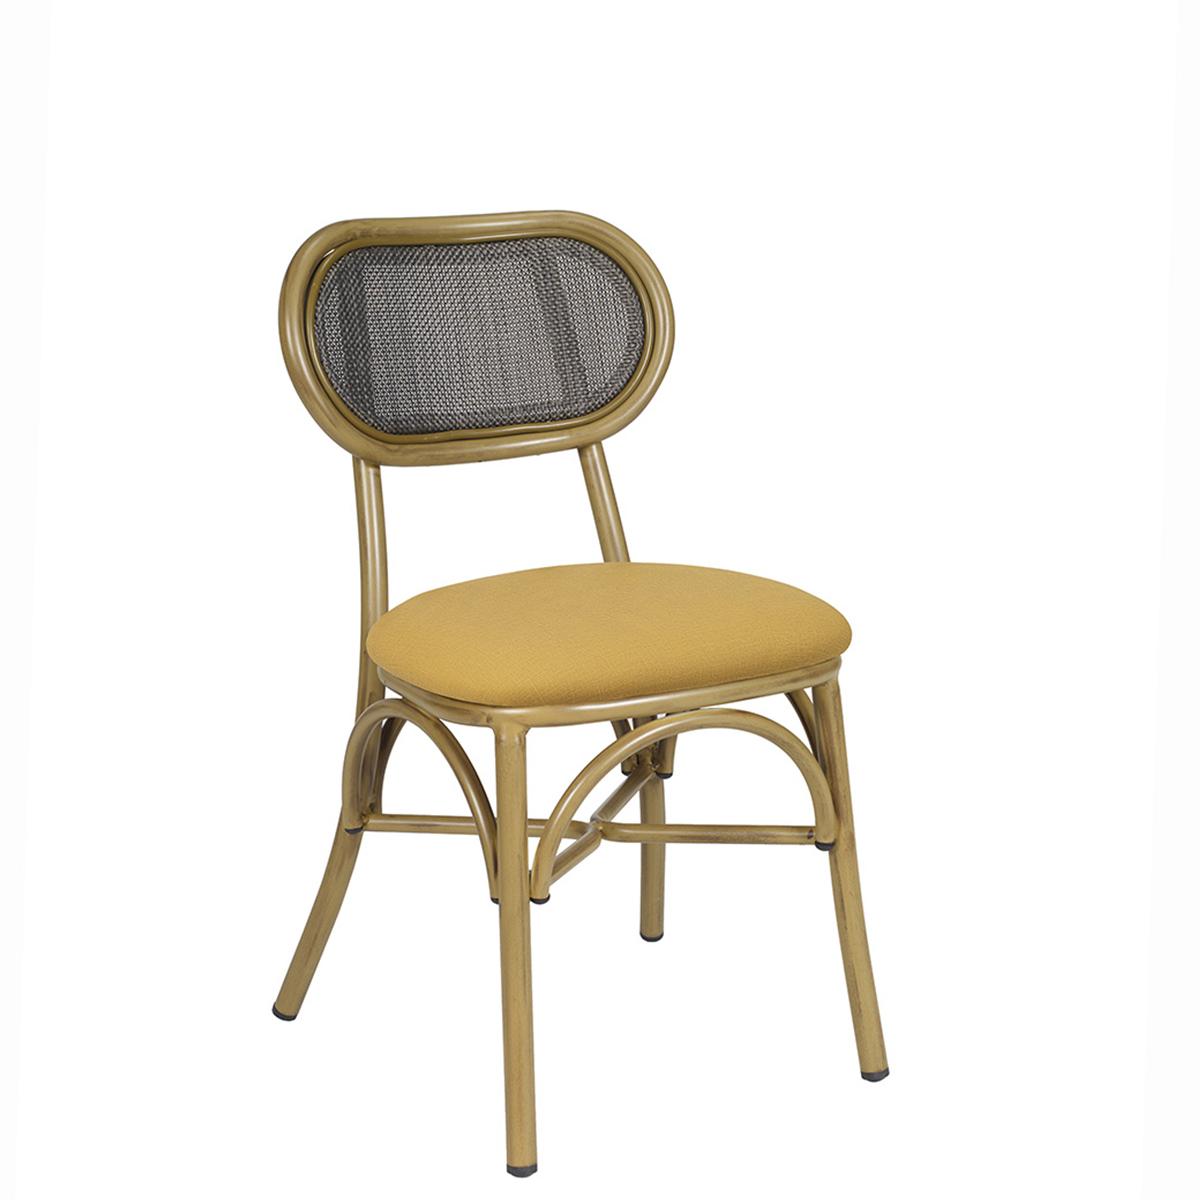 verdi-silla-deco-bambu-respaldo-negro-asiento-tapizado-mostaza